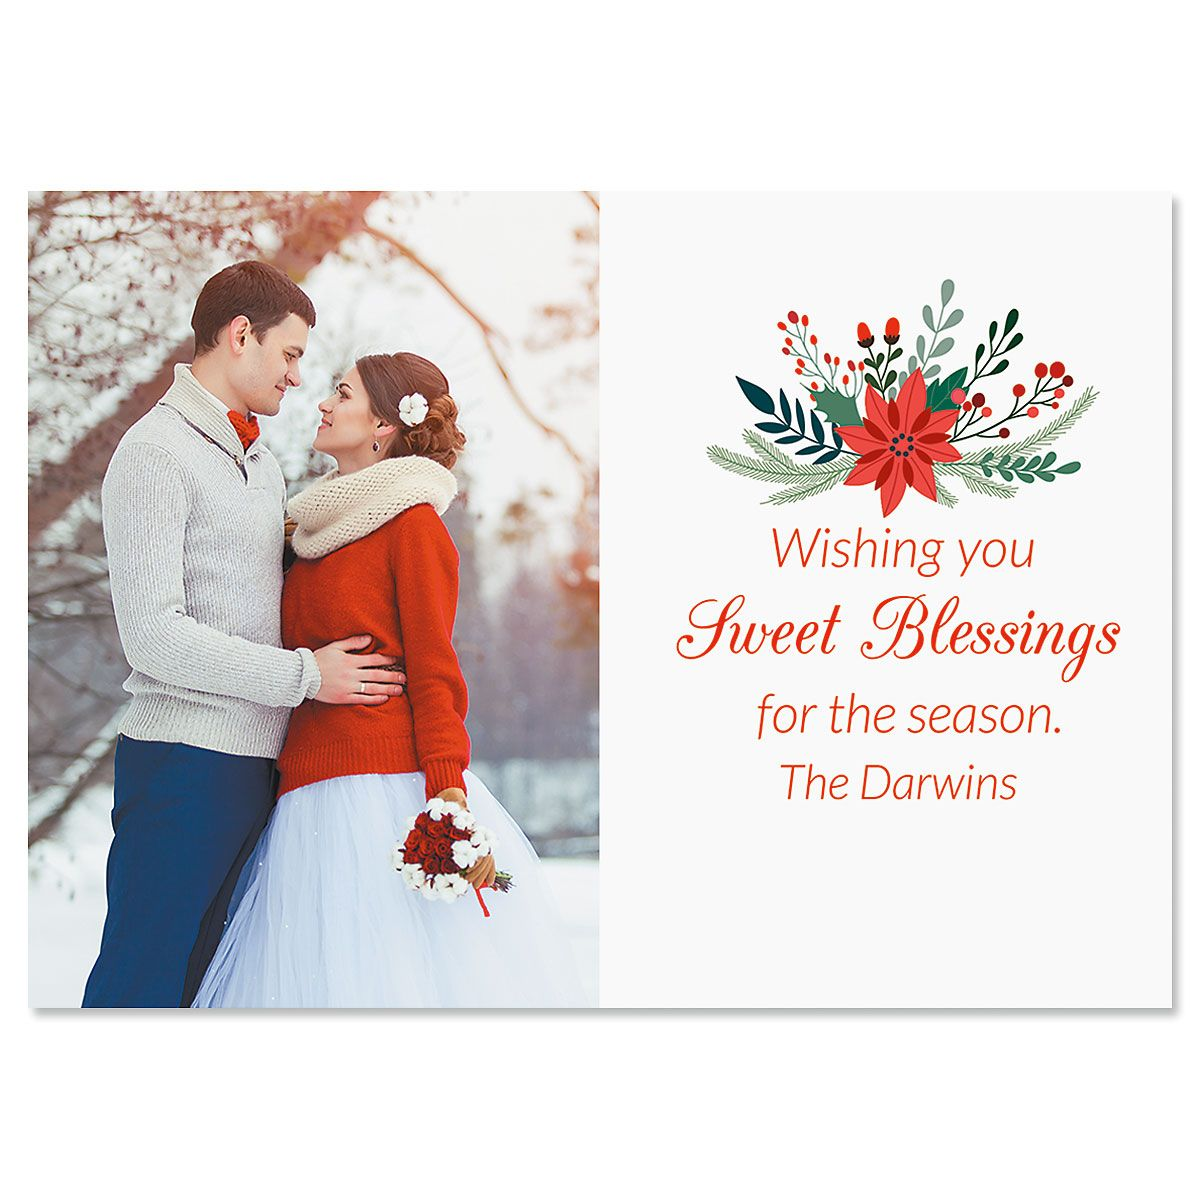 Sweet Blessings Custom Photo Christmas Cards